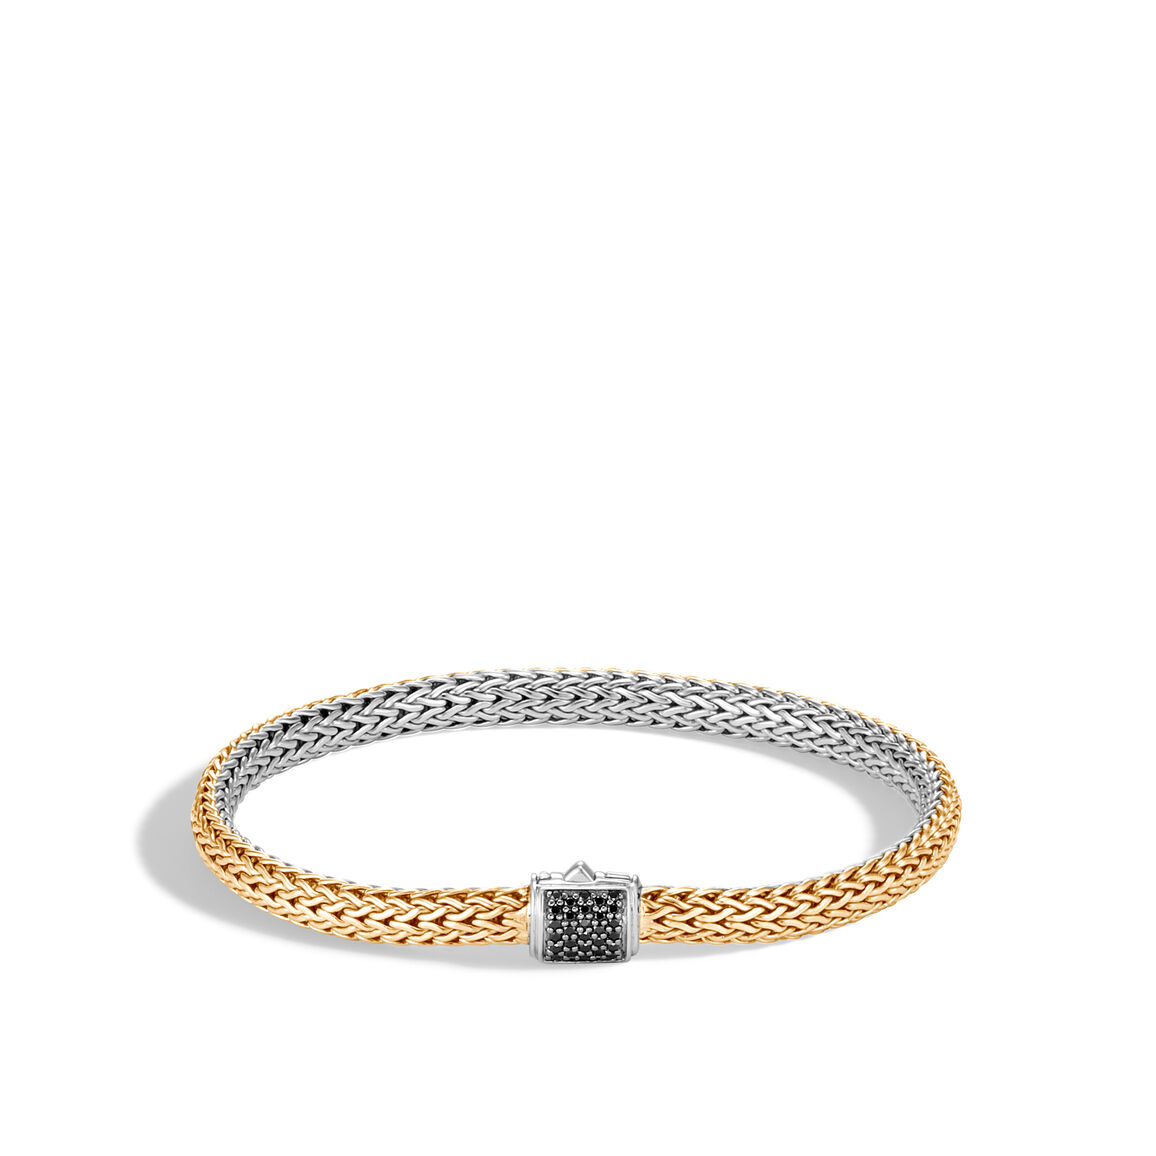 Classic Chain 5MM Reversible Bracelet, Silver, 18K, Gems